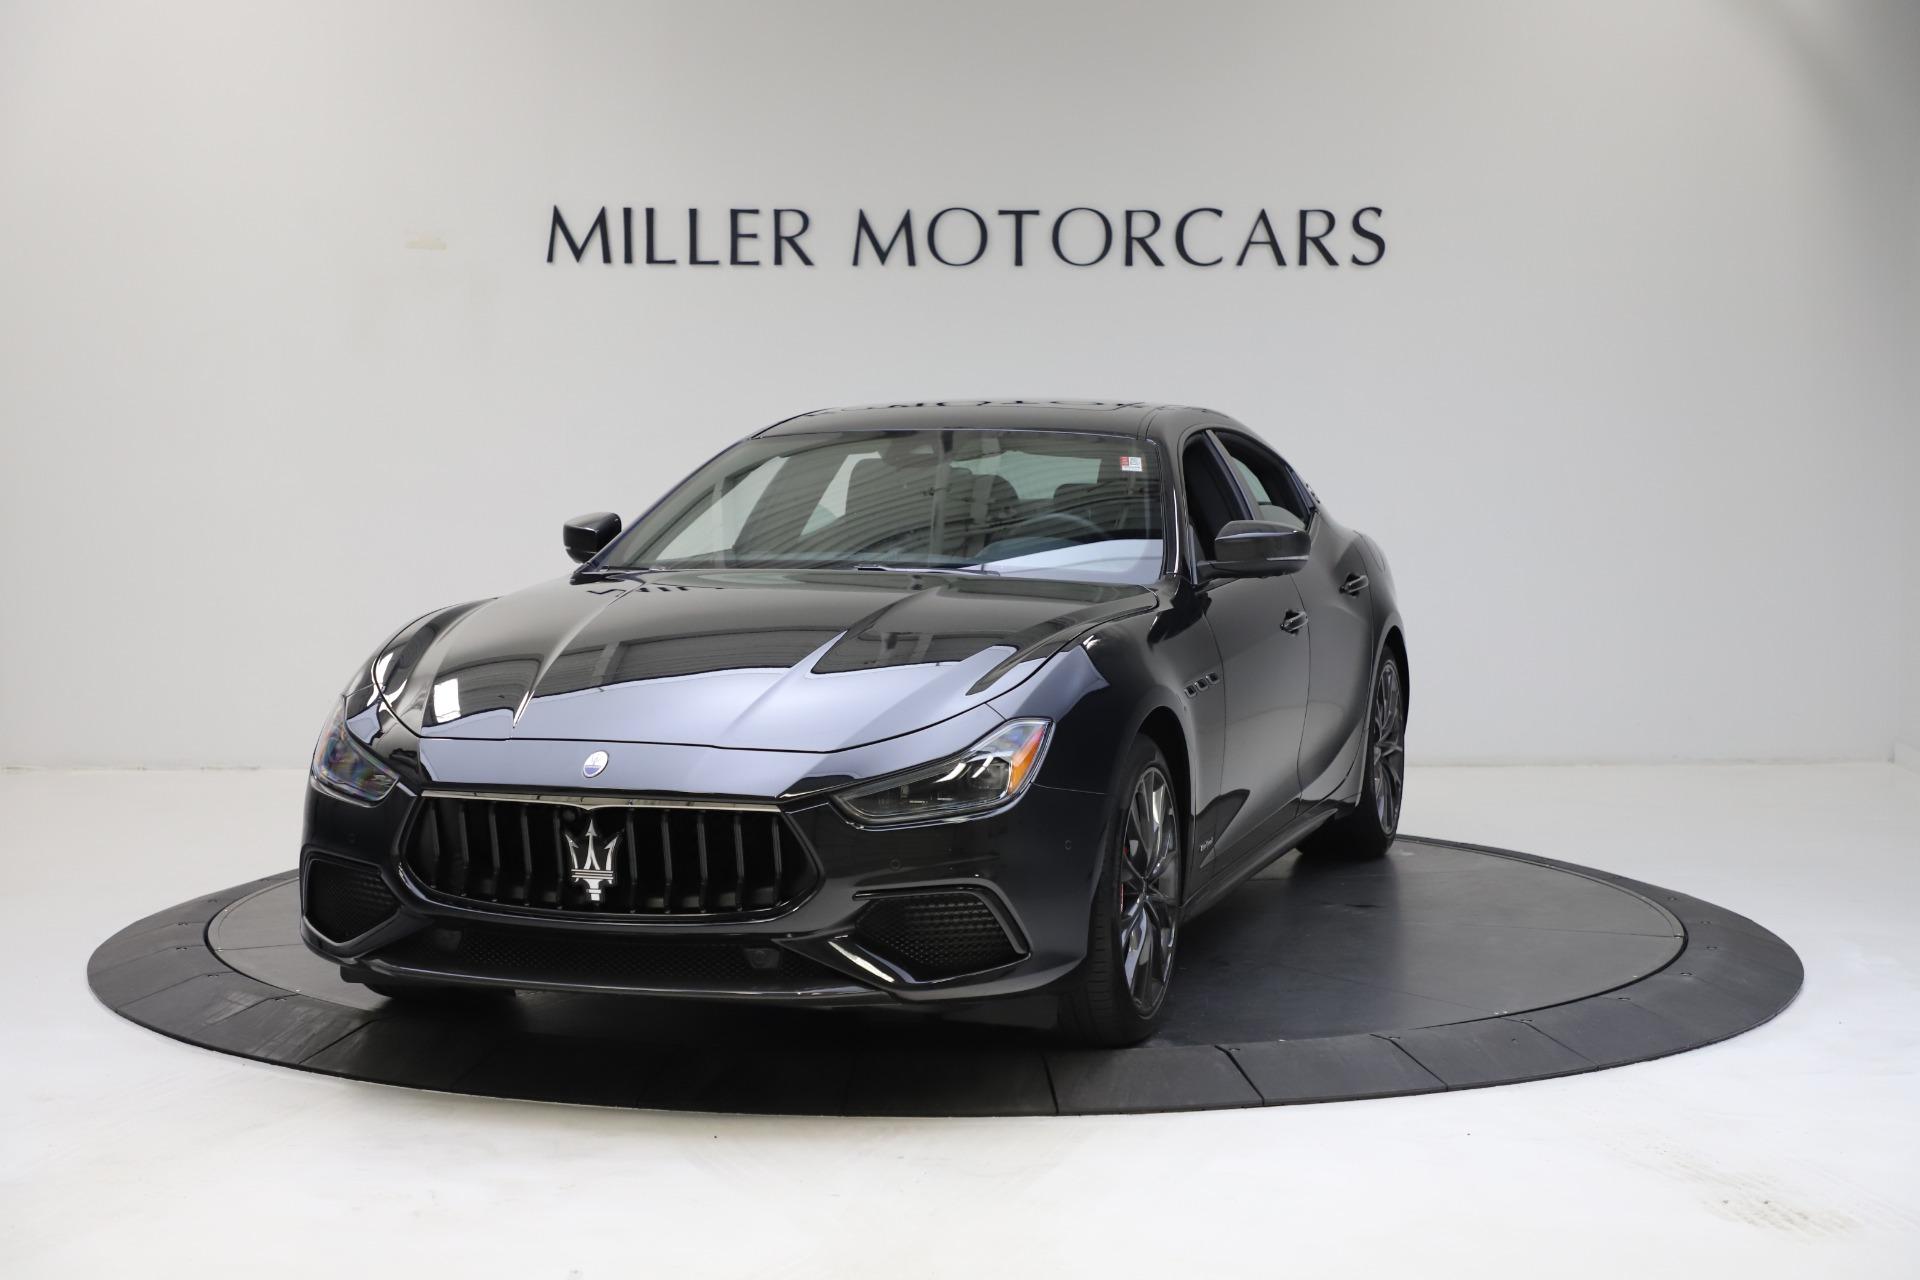 New 2021 Maserati Ghibli S Q4 GranSport for sale Call for price at Maserati of Westport in Westport CT 06880 1